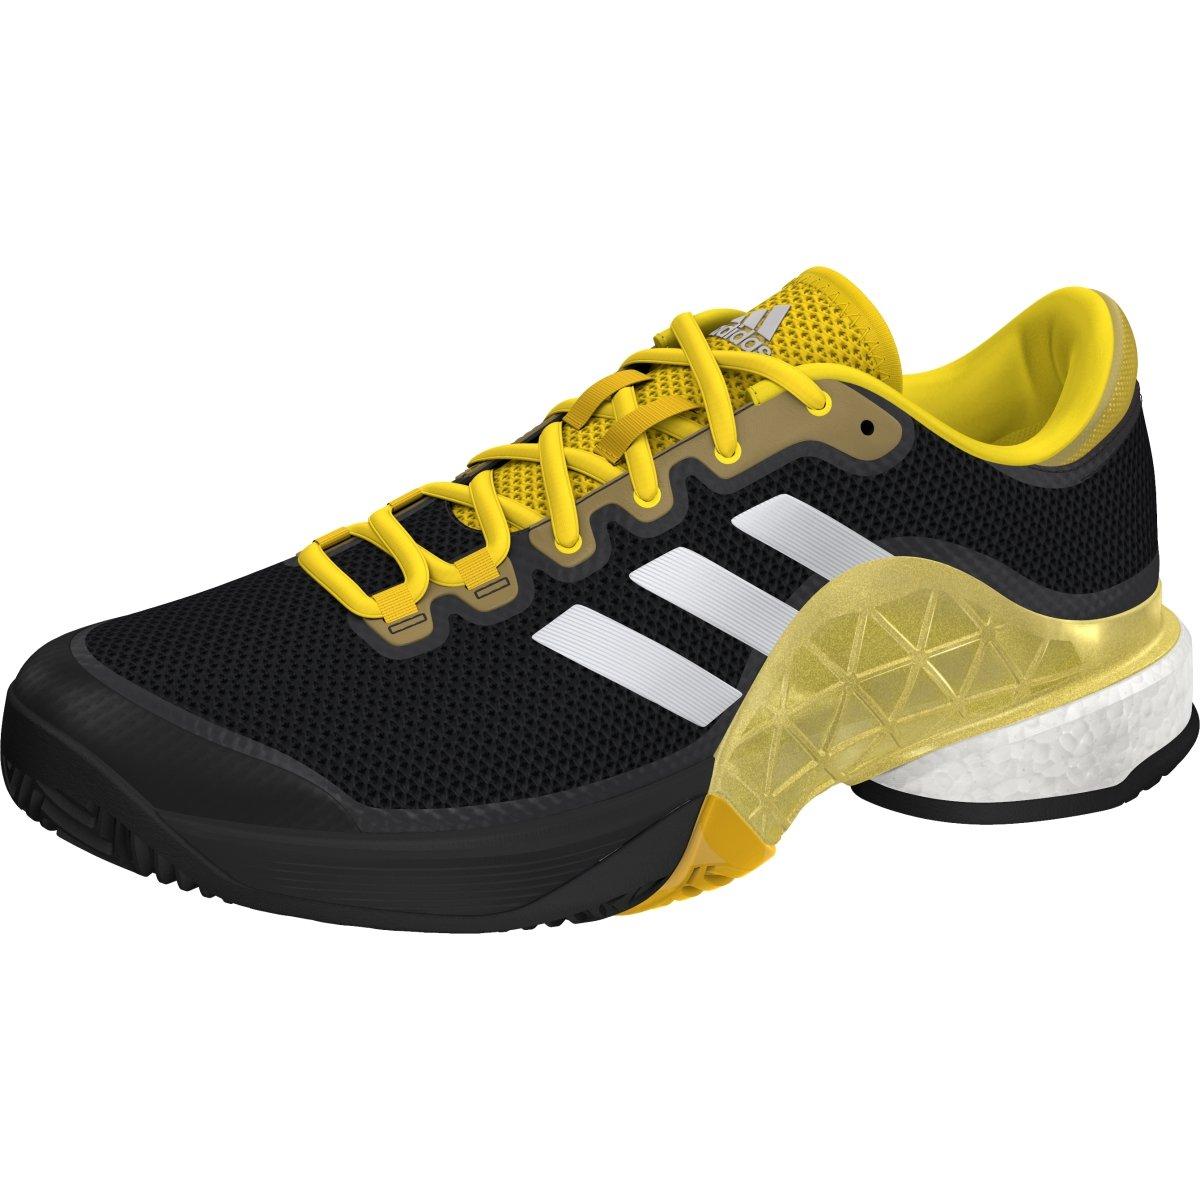 c45874a38 Galleon - Adidas Men s Barricade 2017 Boost Men s Tennis Shoe Core Black  White Equestrian Yellow